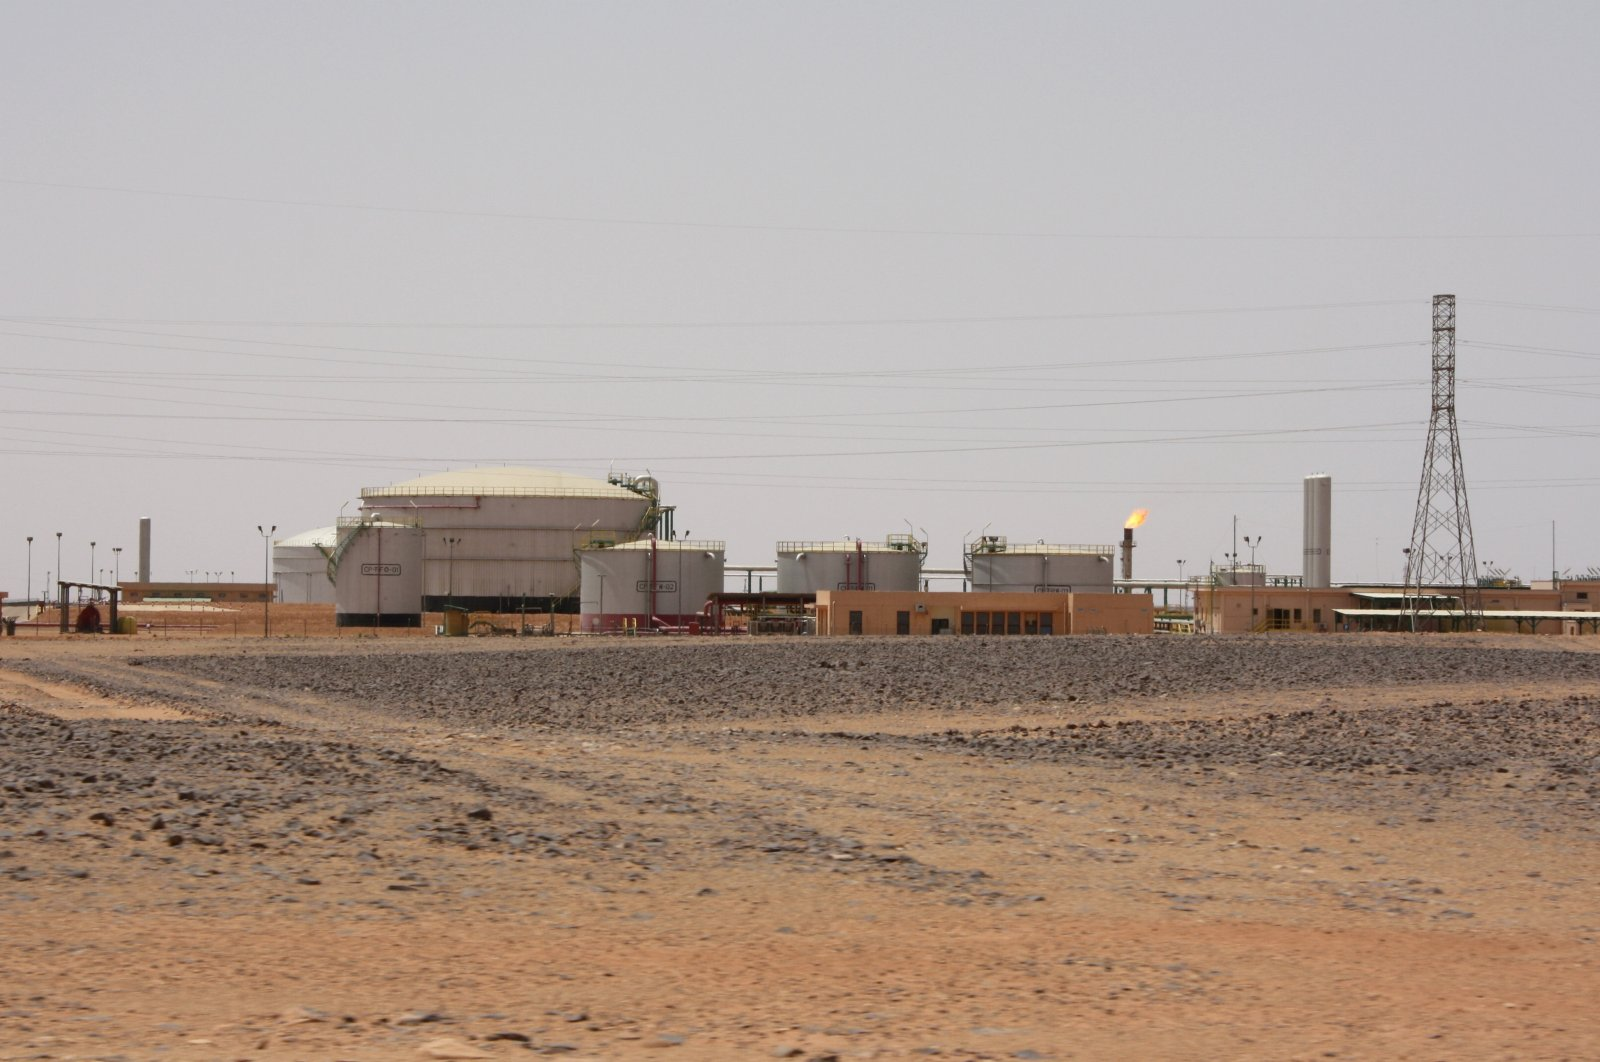 A view shows el Feel oil field near Murzuq, Libya, July 6, 2017. (Reuters Photo)